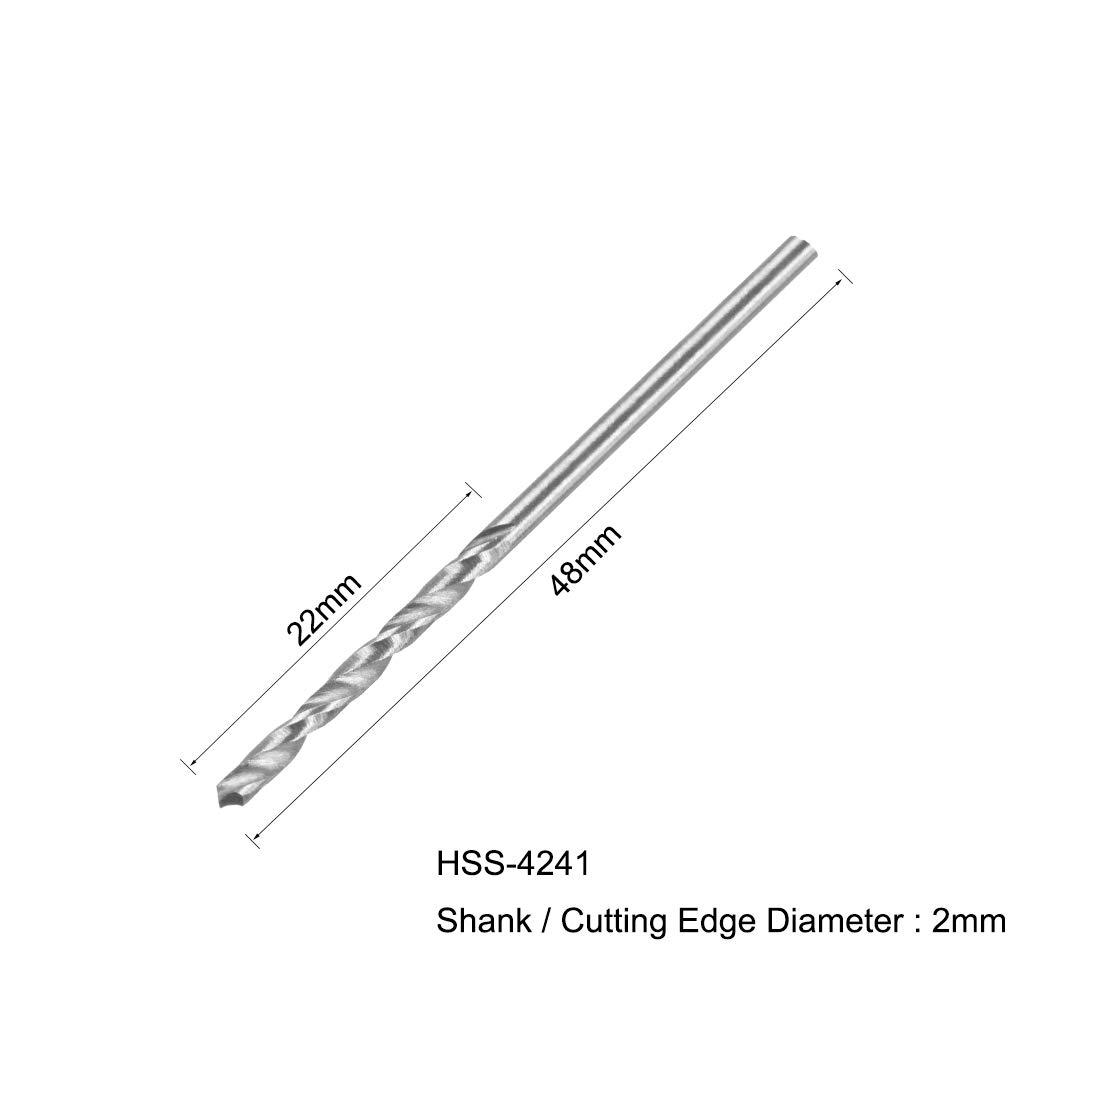 uxcell 1.8 mm Twist Drill High Speed Steel Bit HSS-4241 for Steel,Aluminum Alloy 10pcs